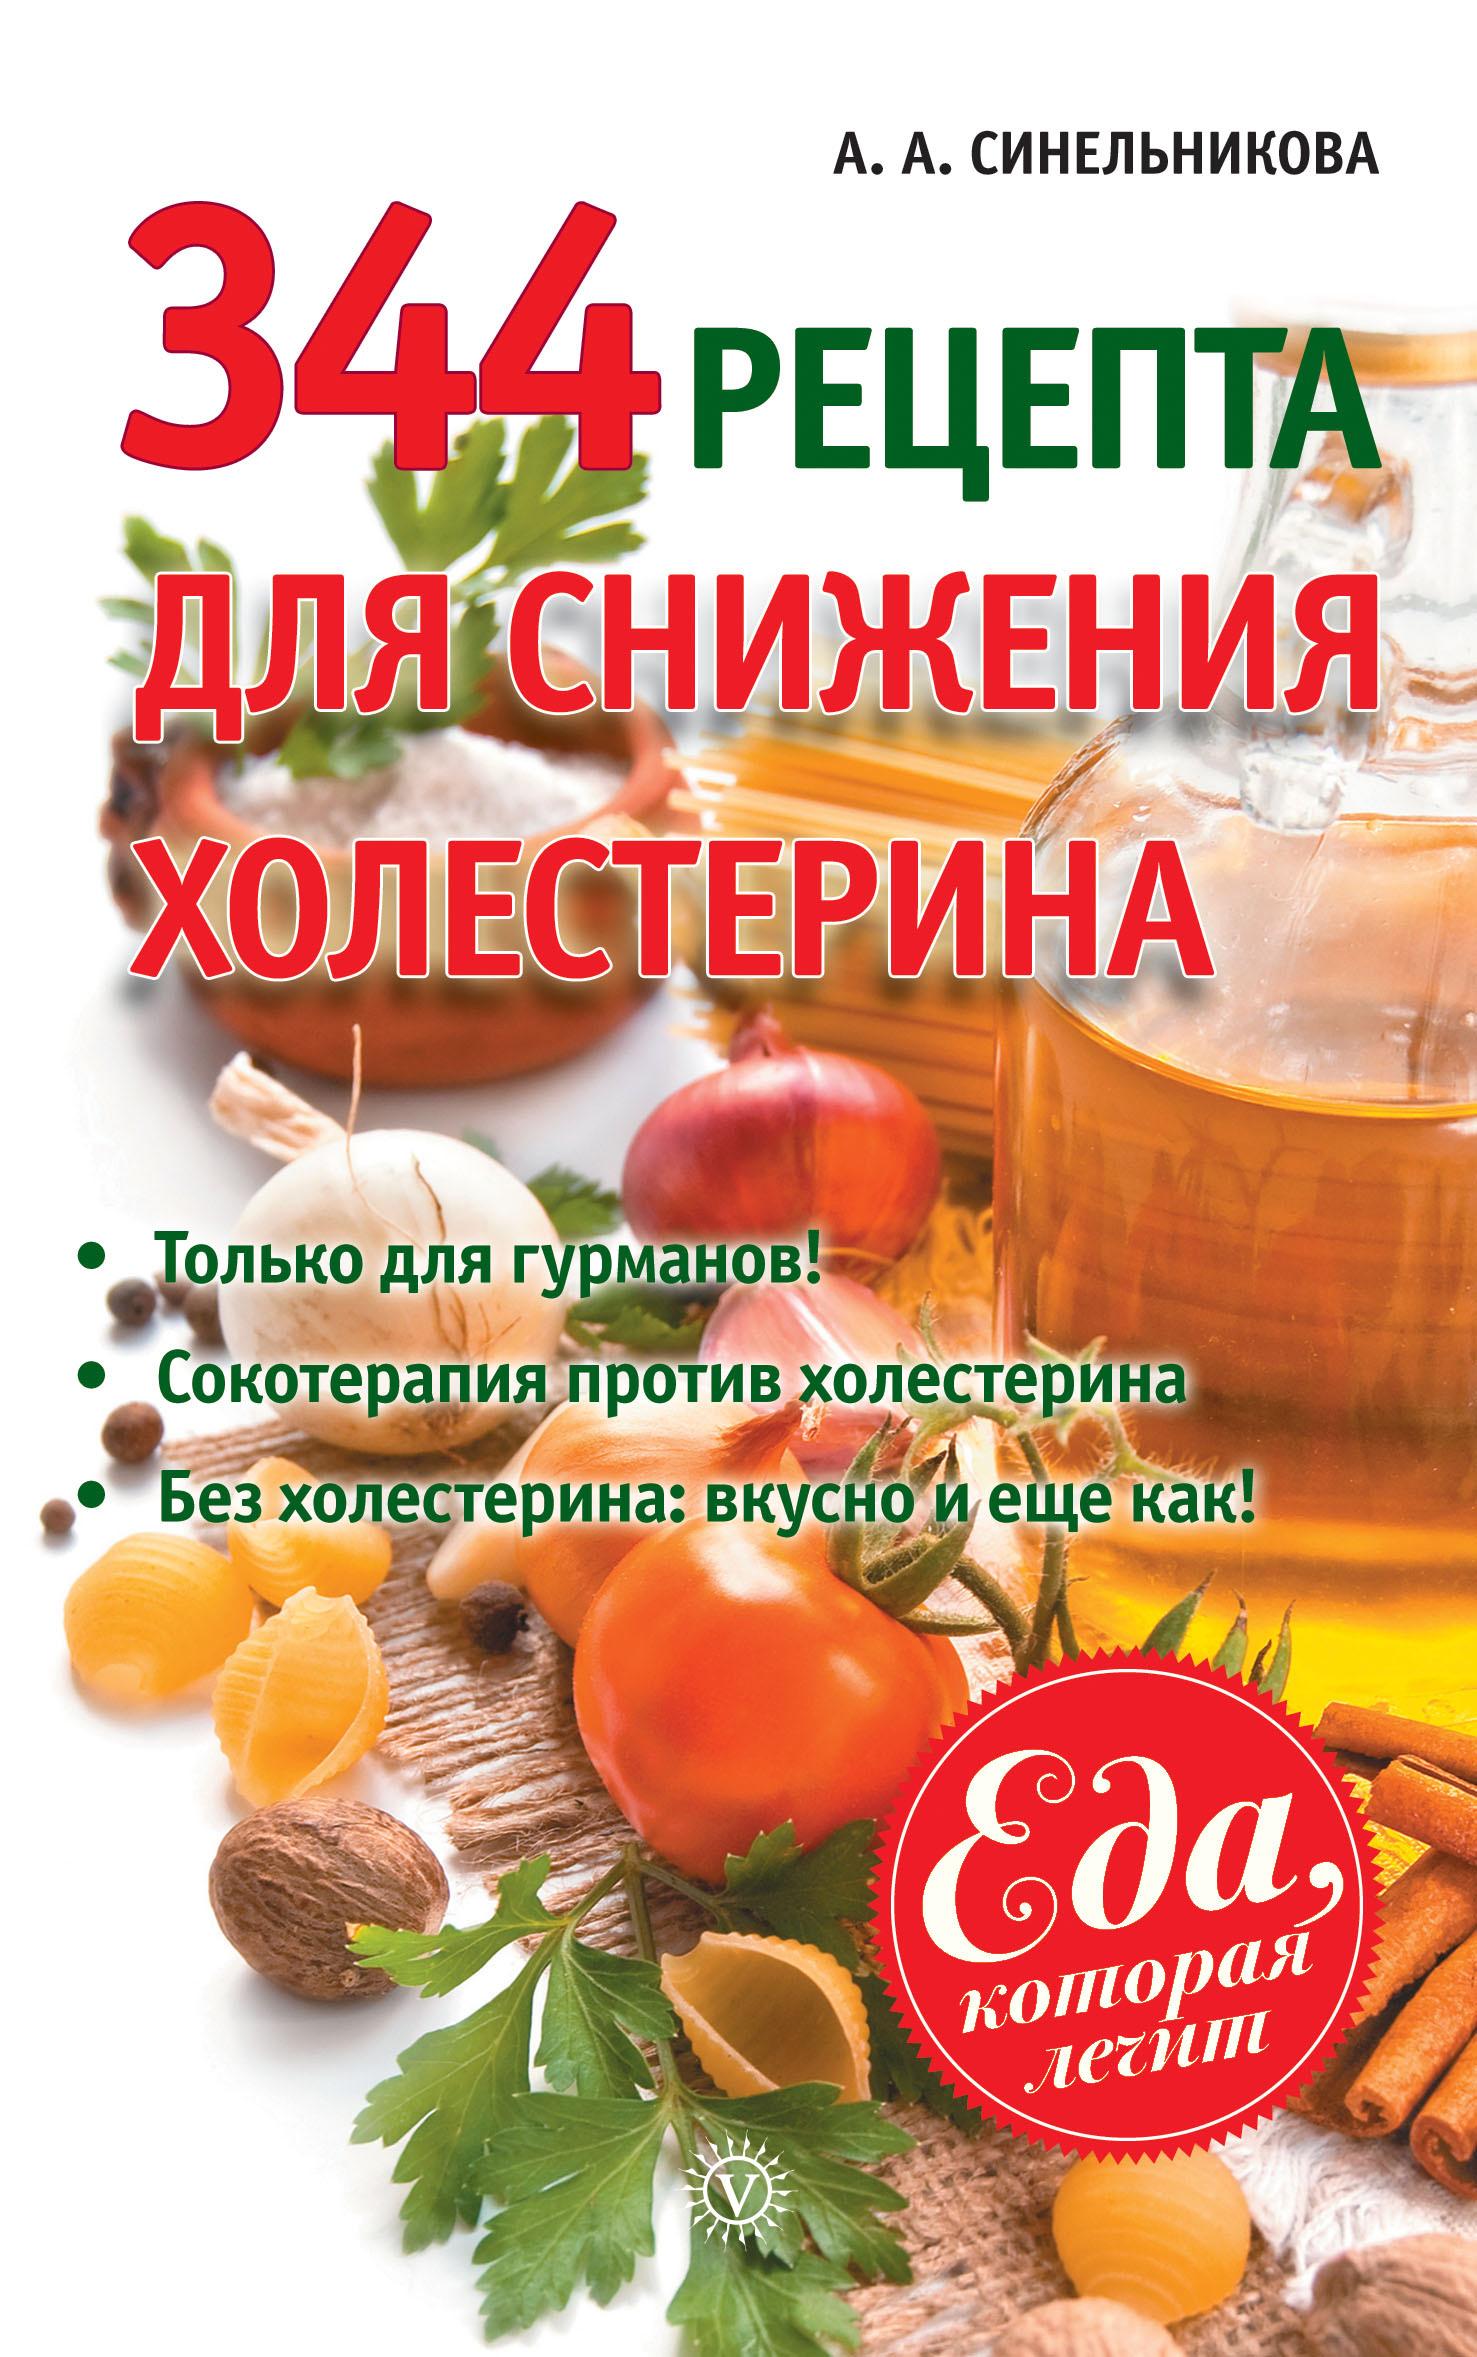 А. А. Синельникова 344 рецепта для снижения холестерина а а синельникова 172 рецепта лучших блюд без глютена